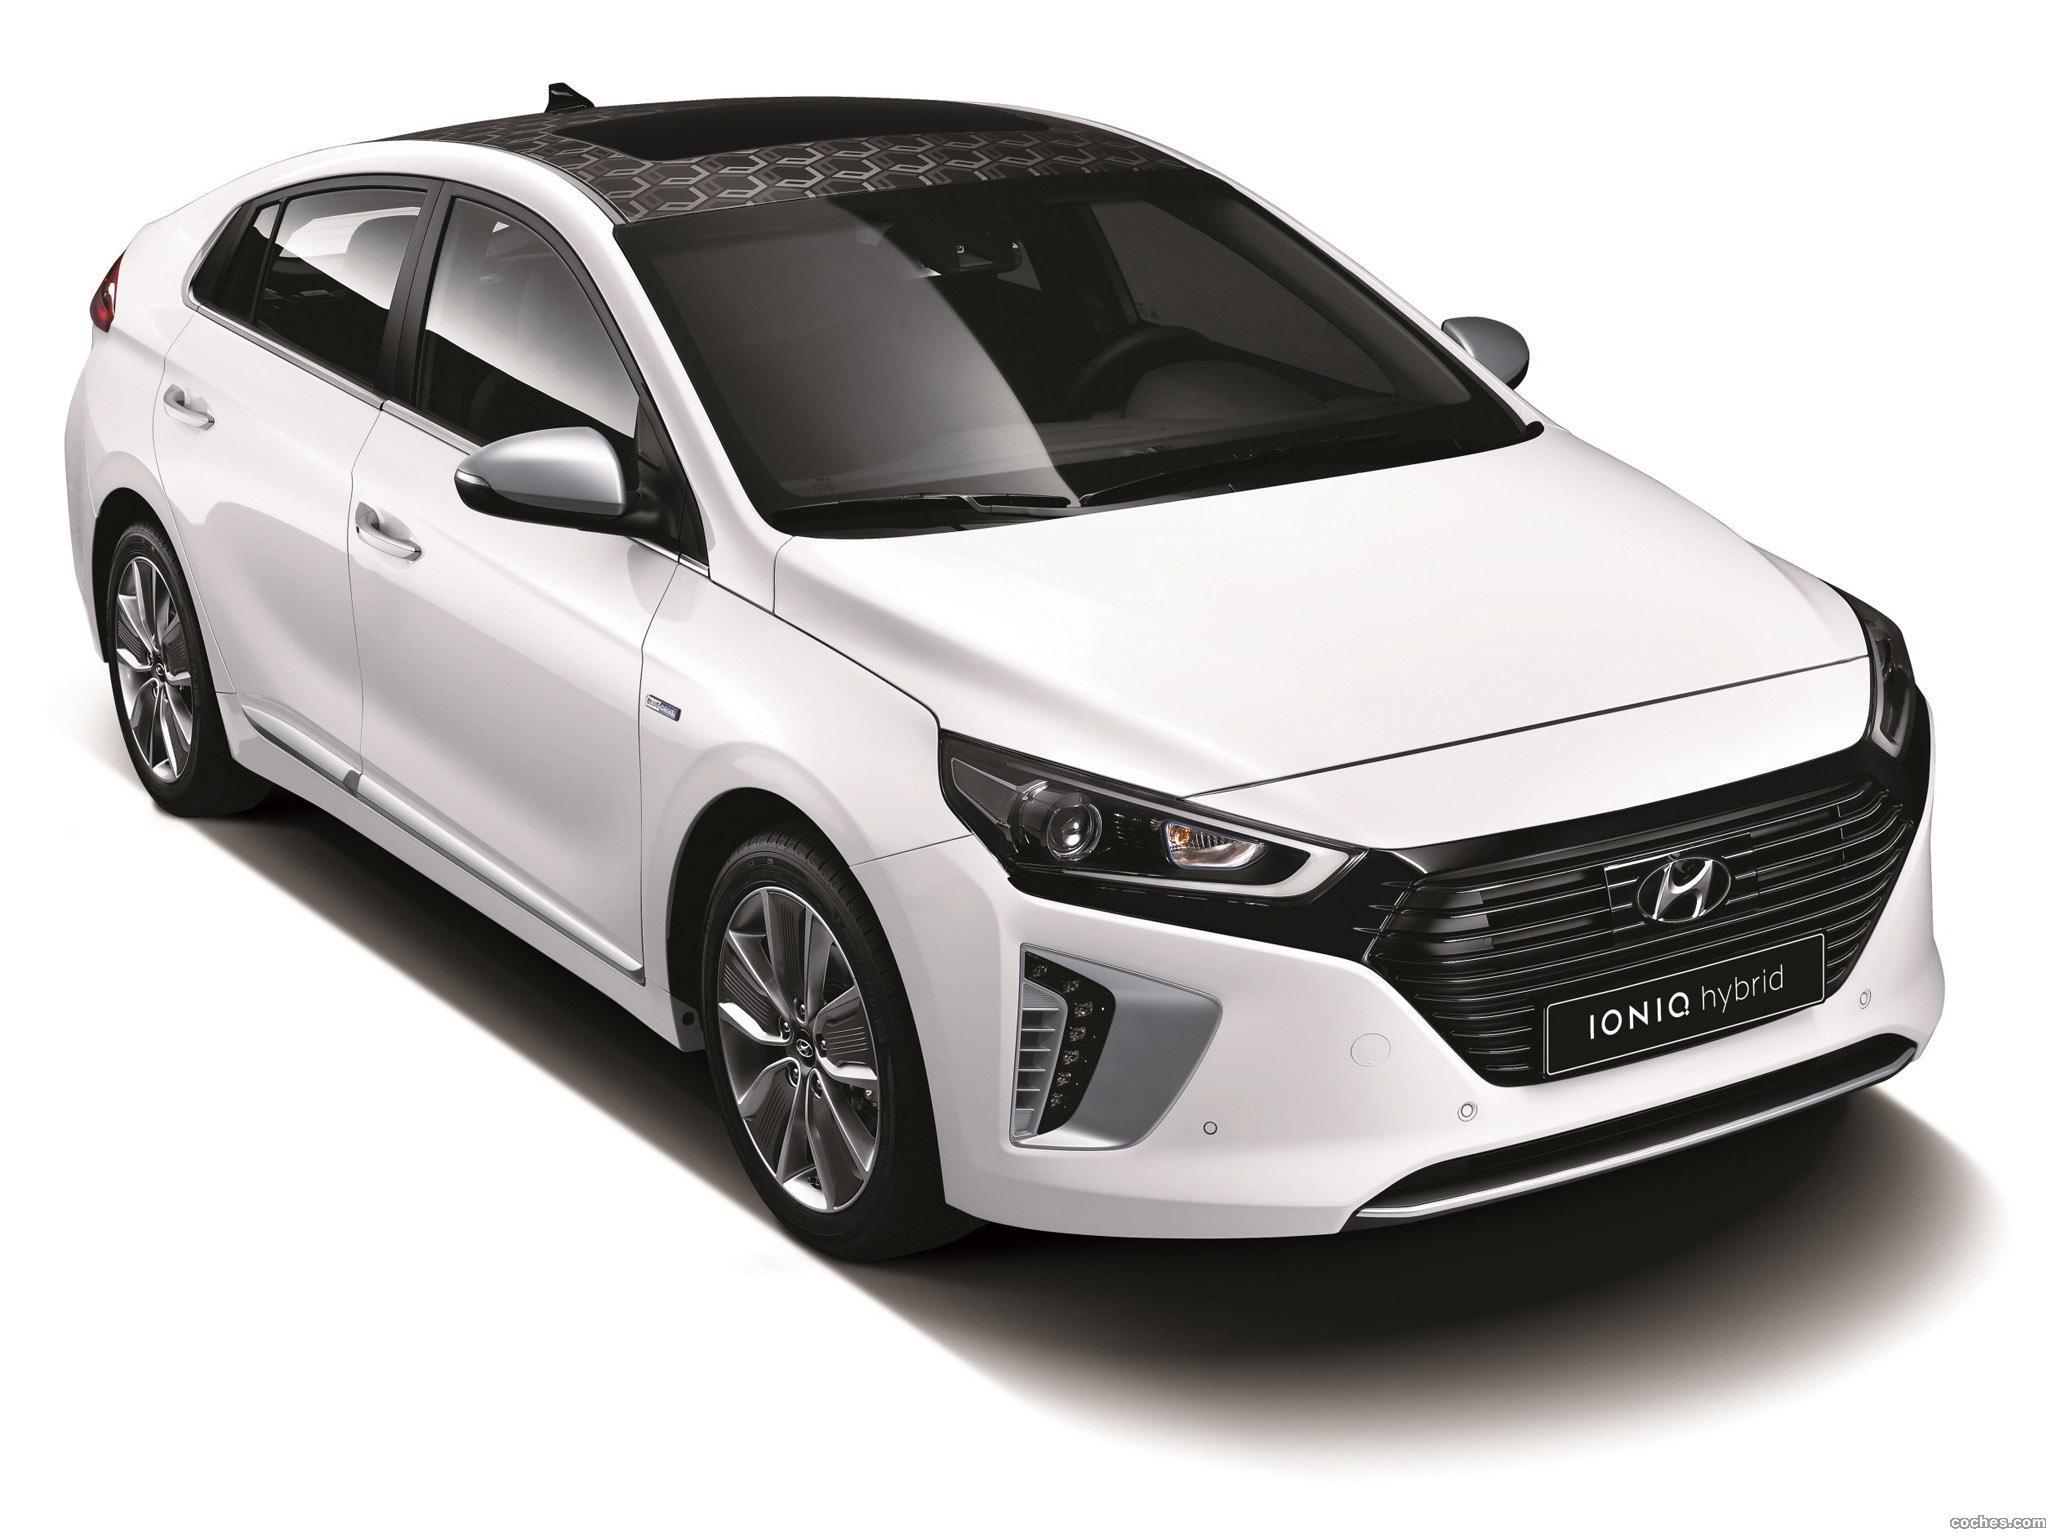 Foto 7 de Hyundai IONIQ Hybrid 2016